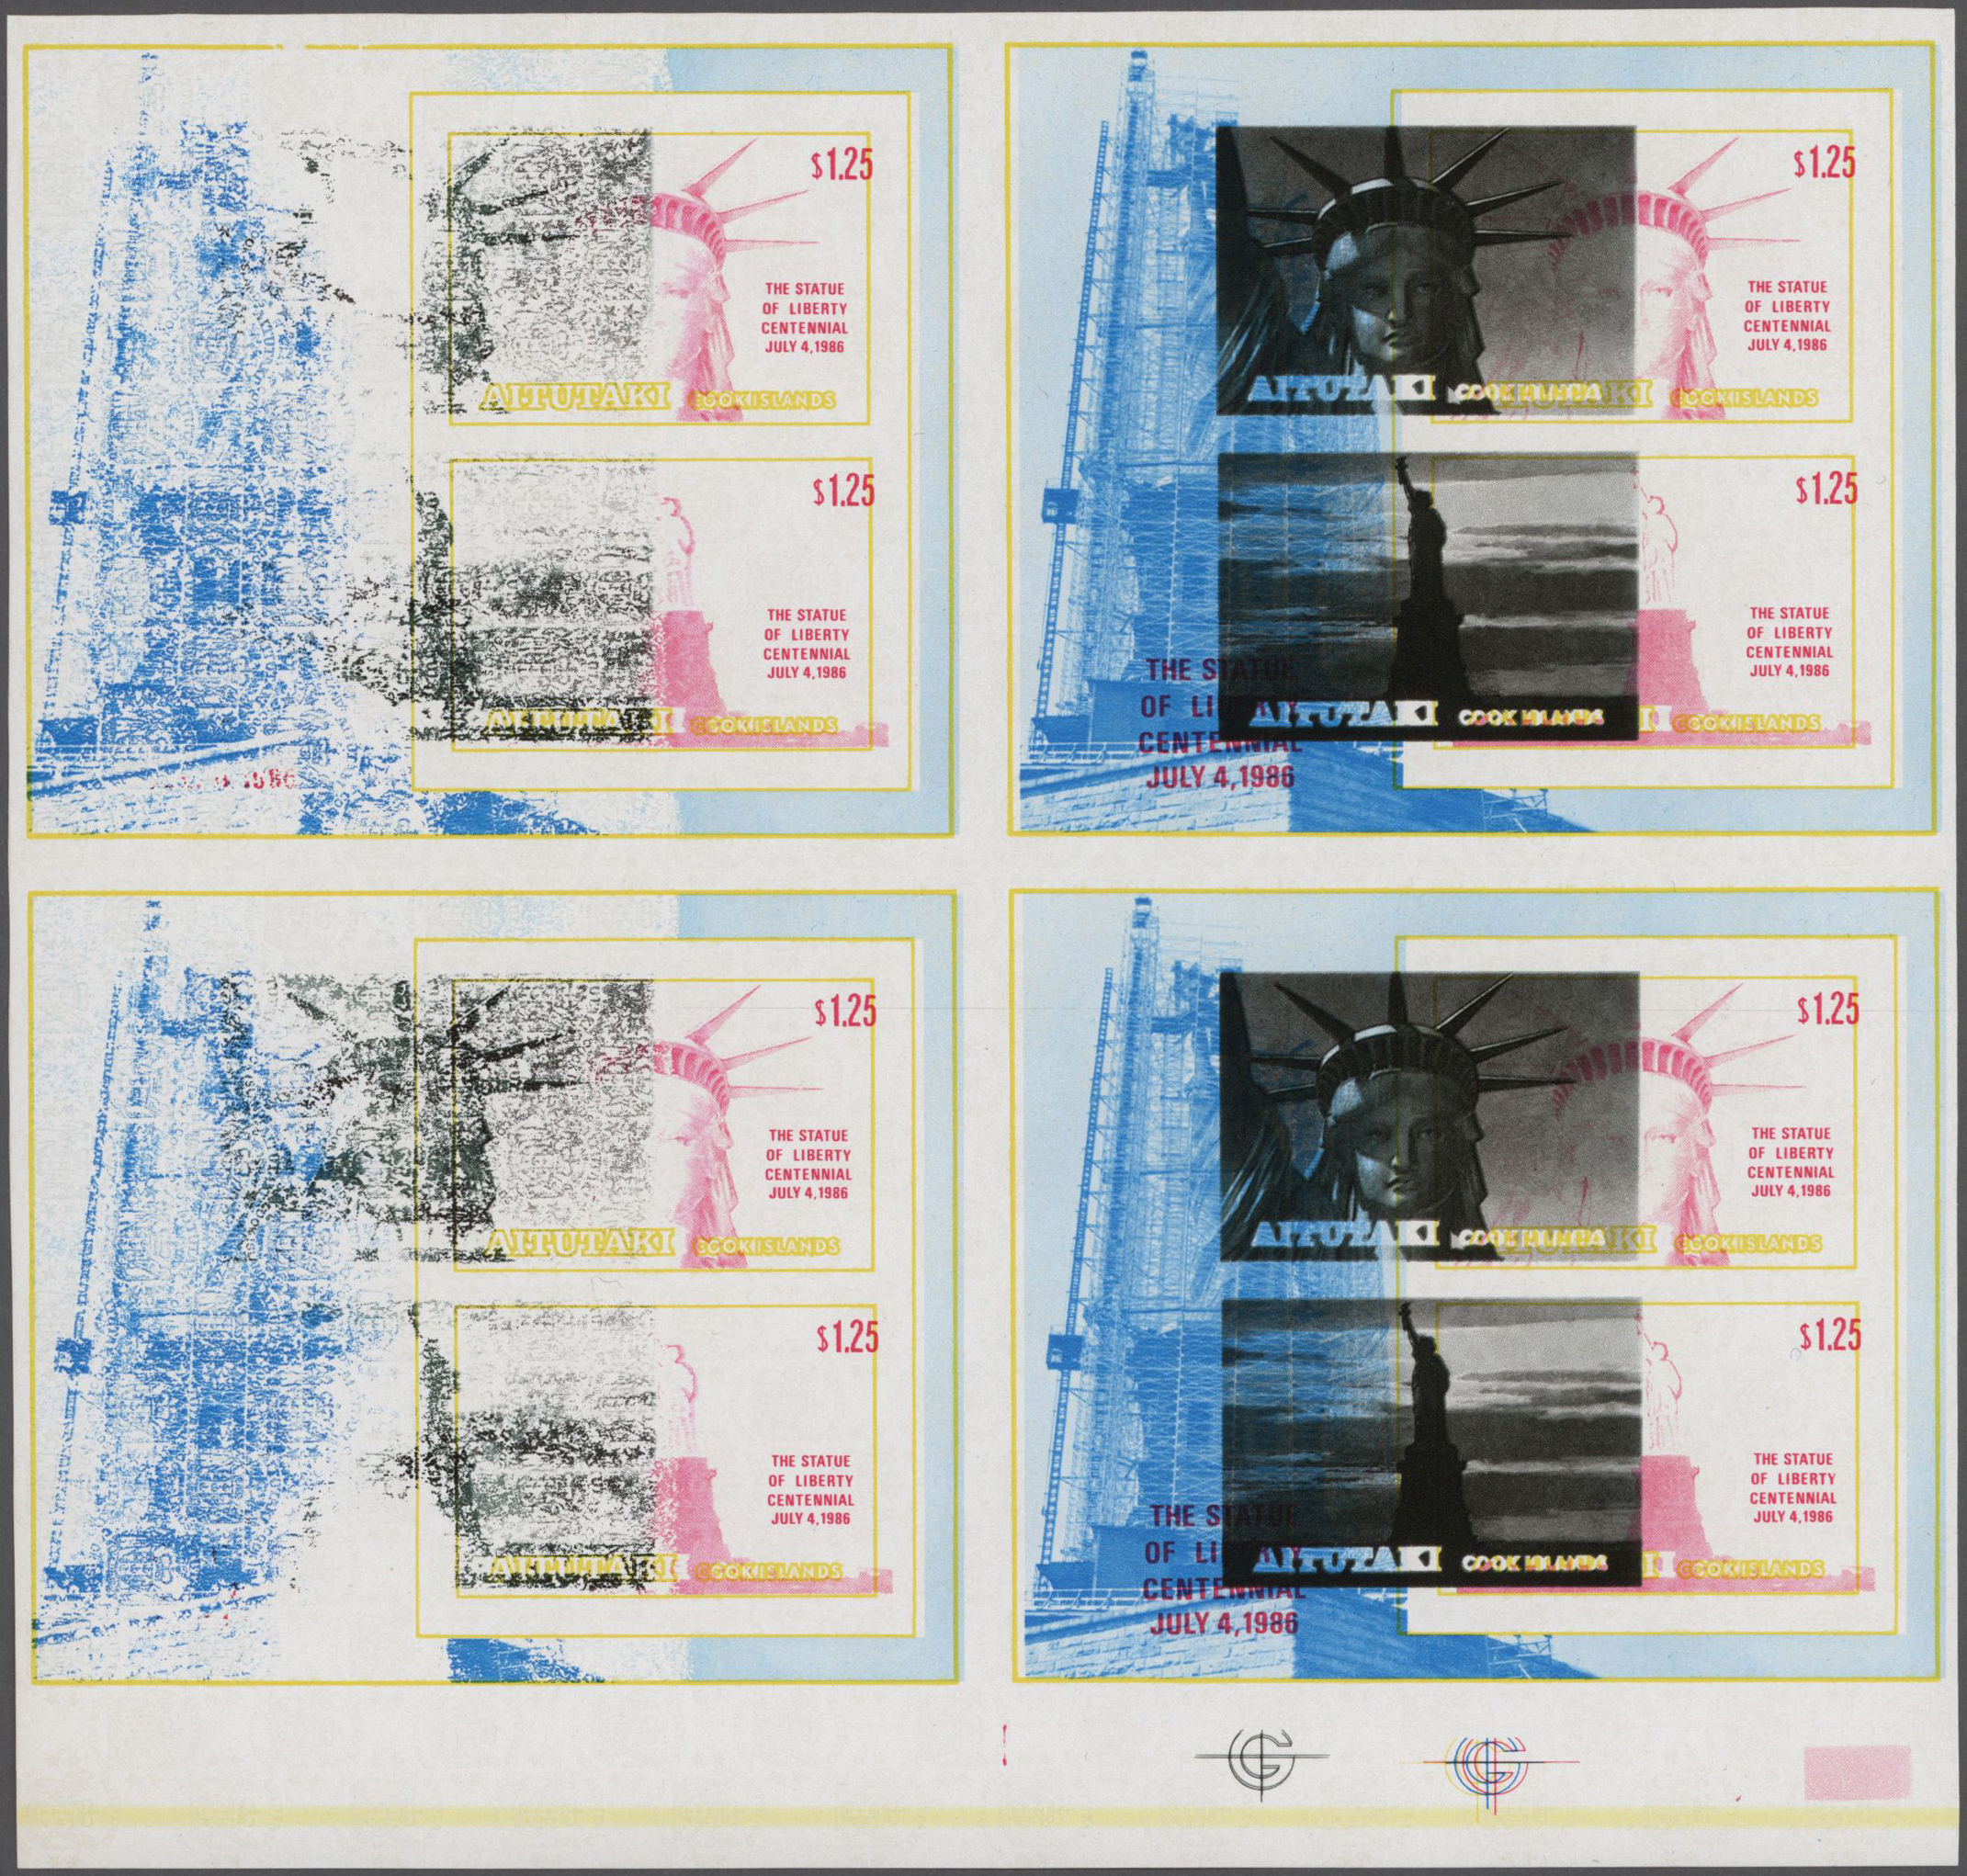 Lot 20569 - thematische philatelie  -  Auktionshaus Christoph Gärtner GmbH & Co. KG Sale #47 Collections: Overseas, Thematics, Europe